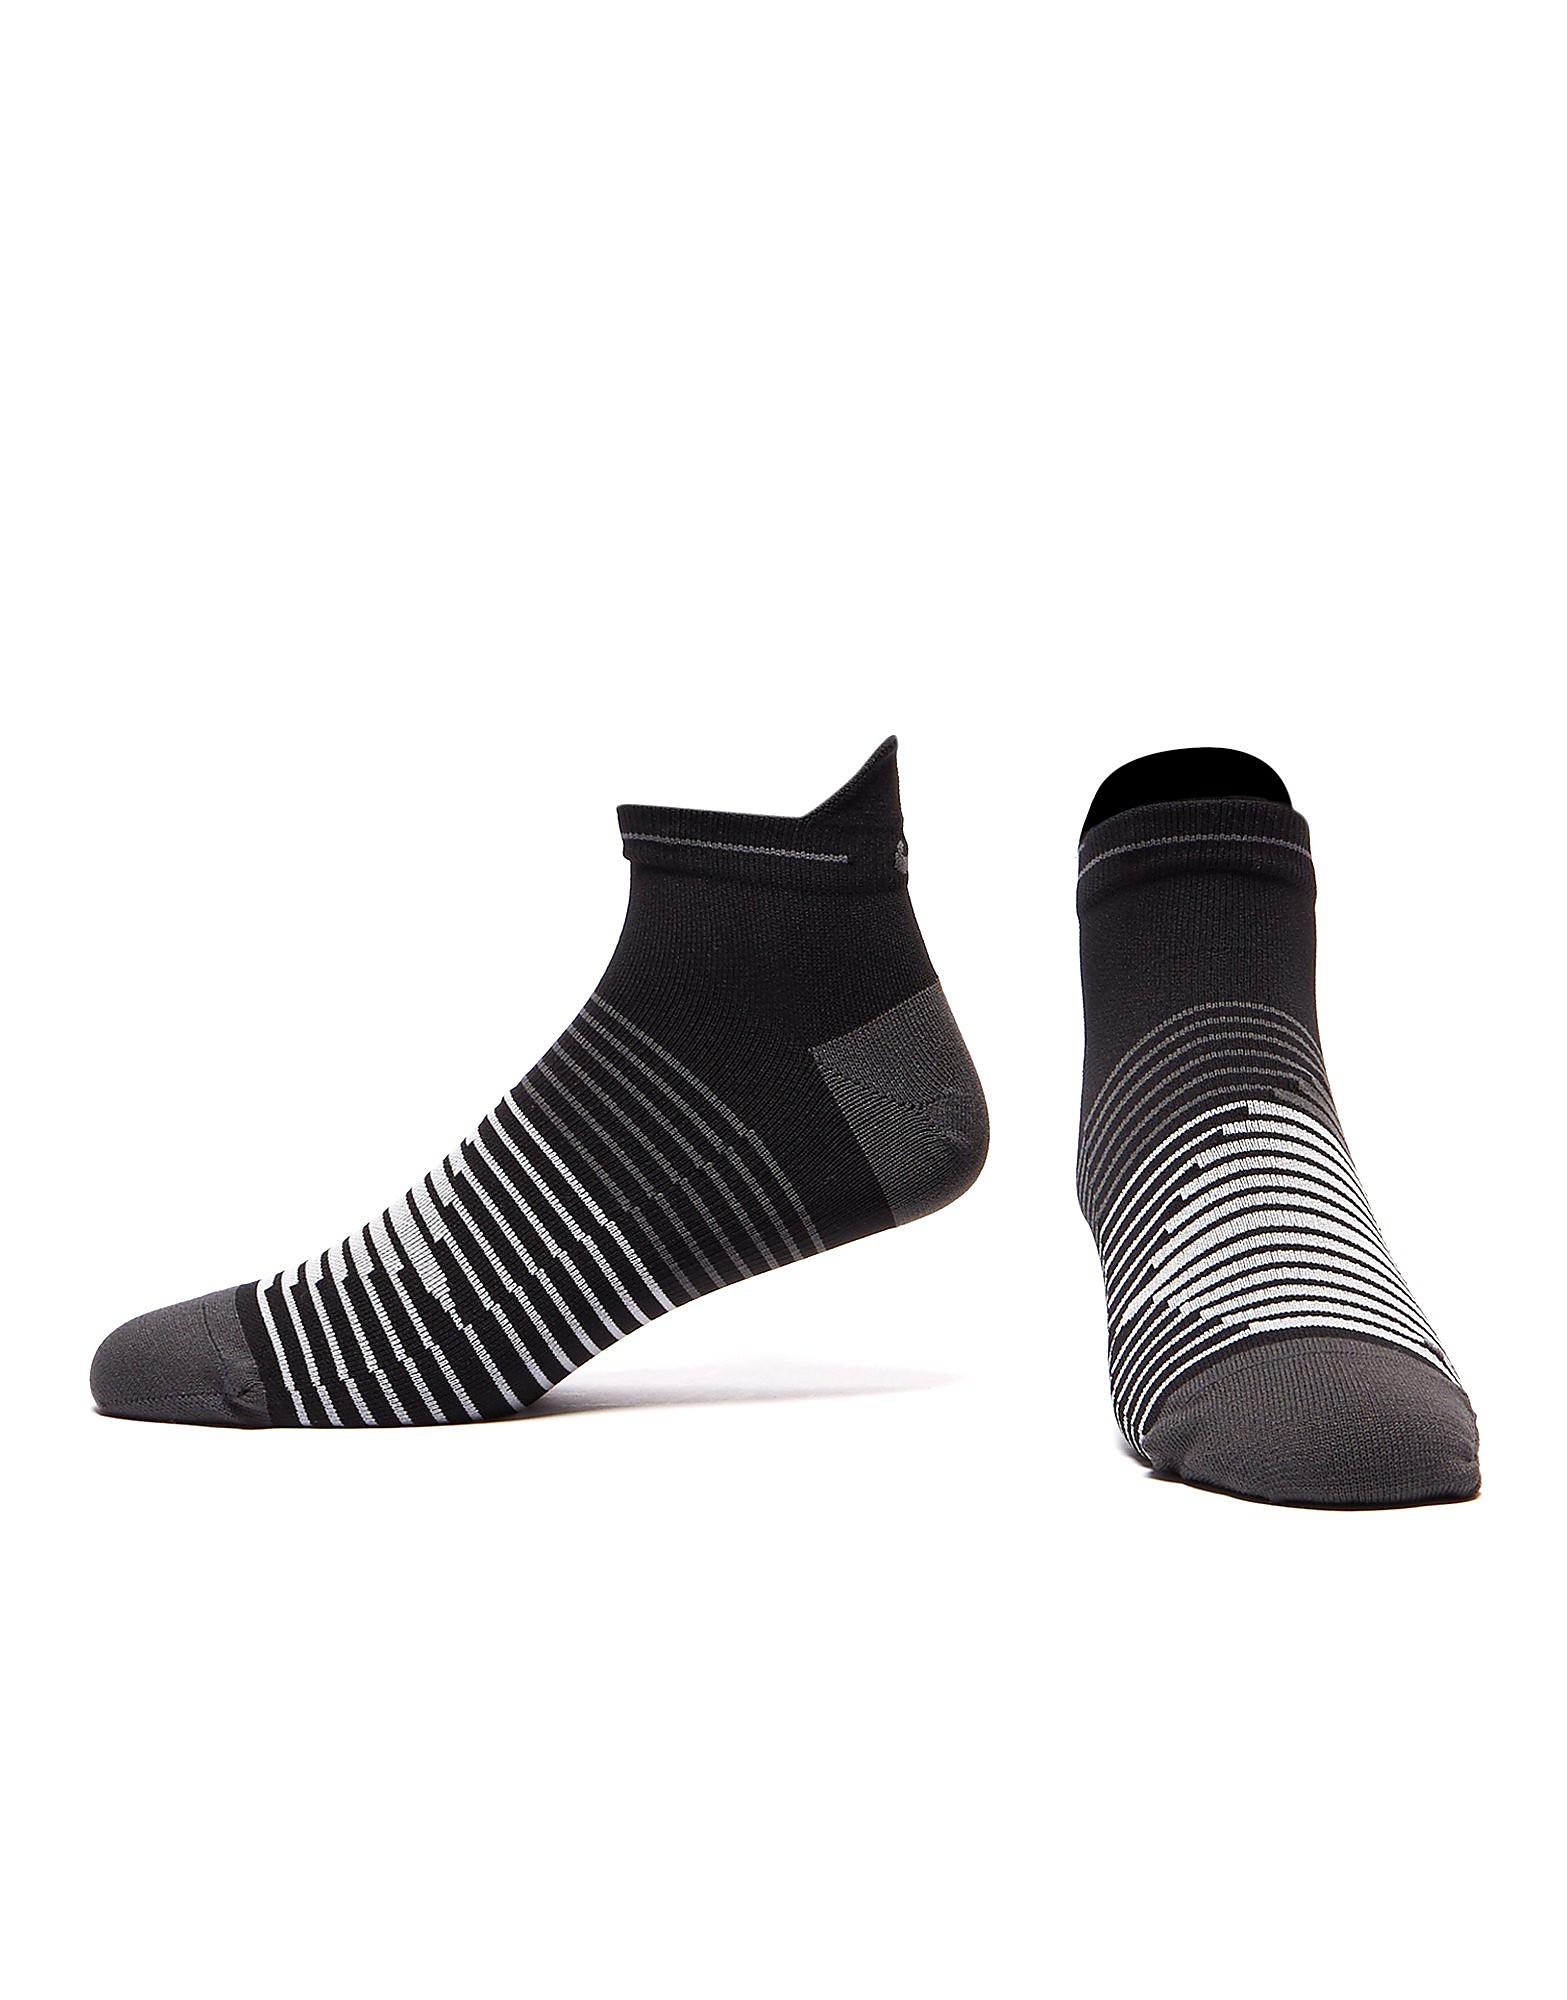 Nike calcetines Run Performance Lightweight